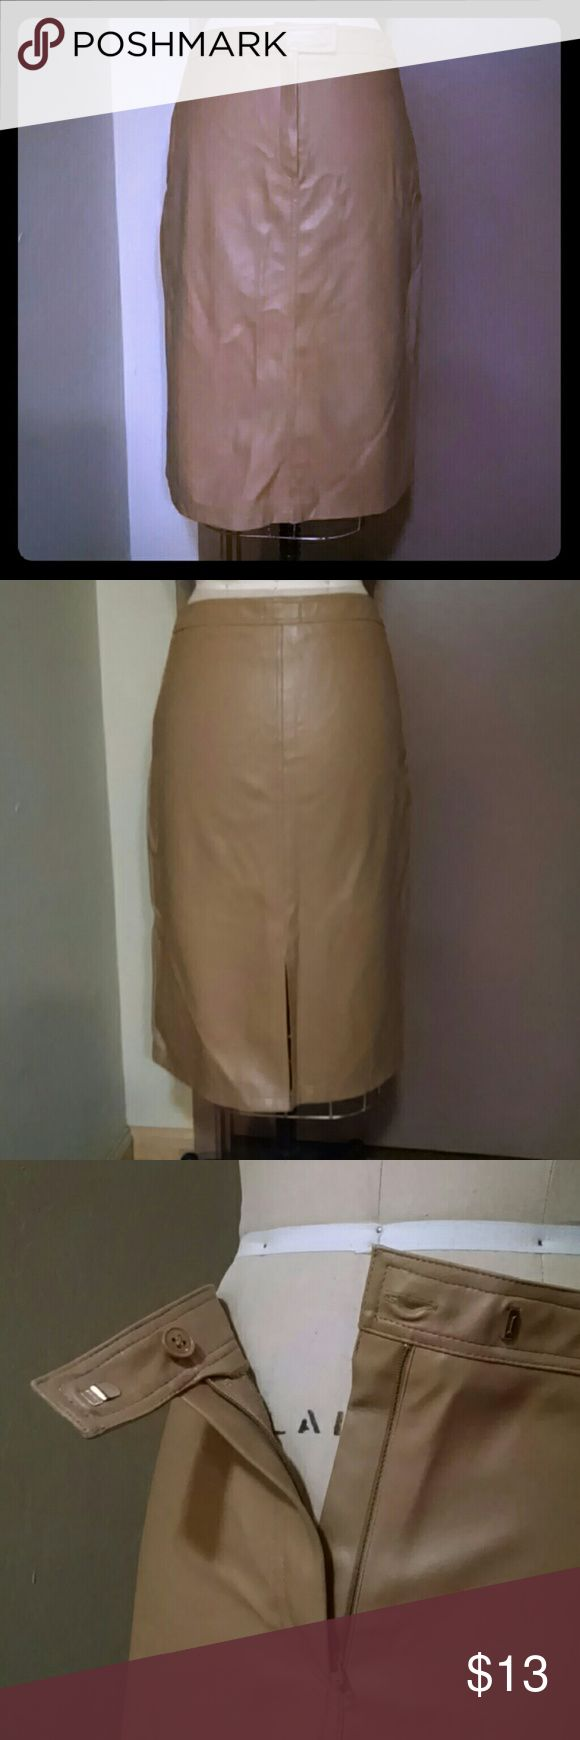 "Camel vinyl Morgan de Toi midi skirt 26"" knit back vinyl with center front placket closure. 8.5"" slit at center back hem. Smooth band at waist sits below waistline. From a smoke free, pet free home. Morgan de Toi Skirts Midi"